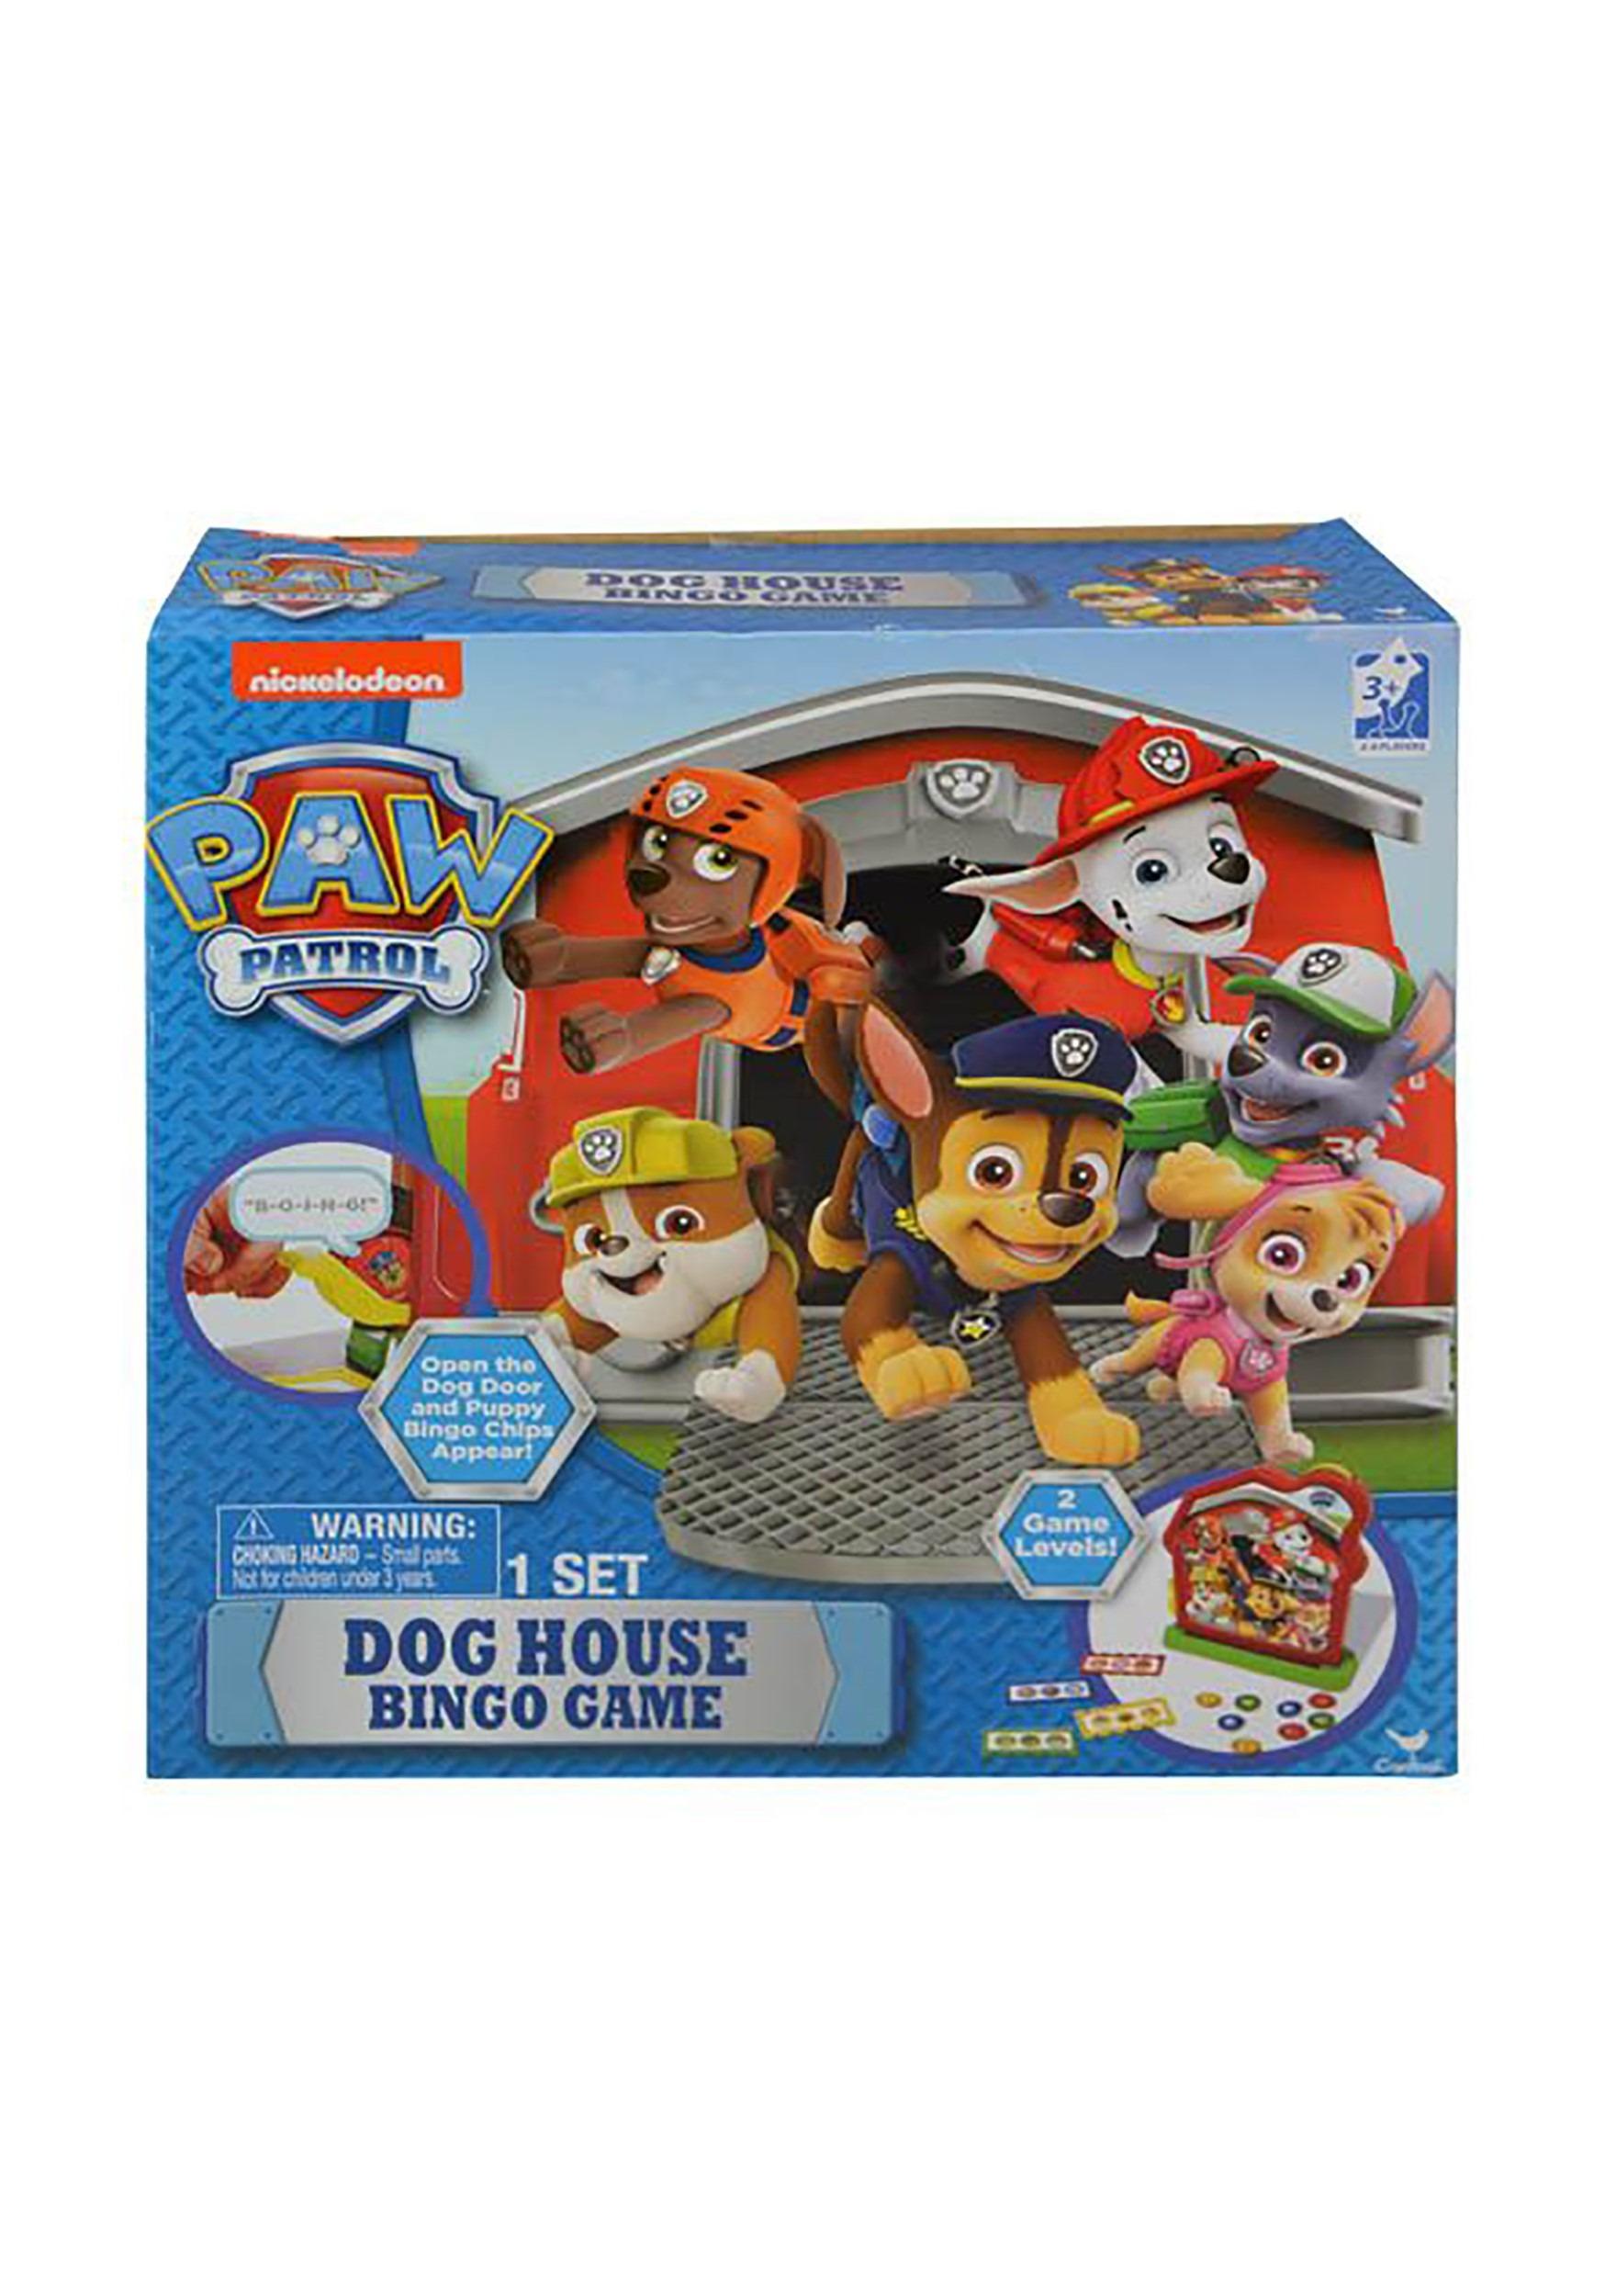 Paw Patrol: Dog House Bingo Game